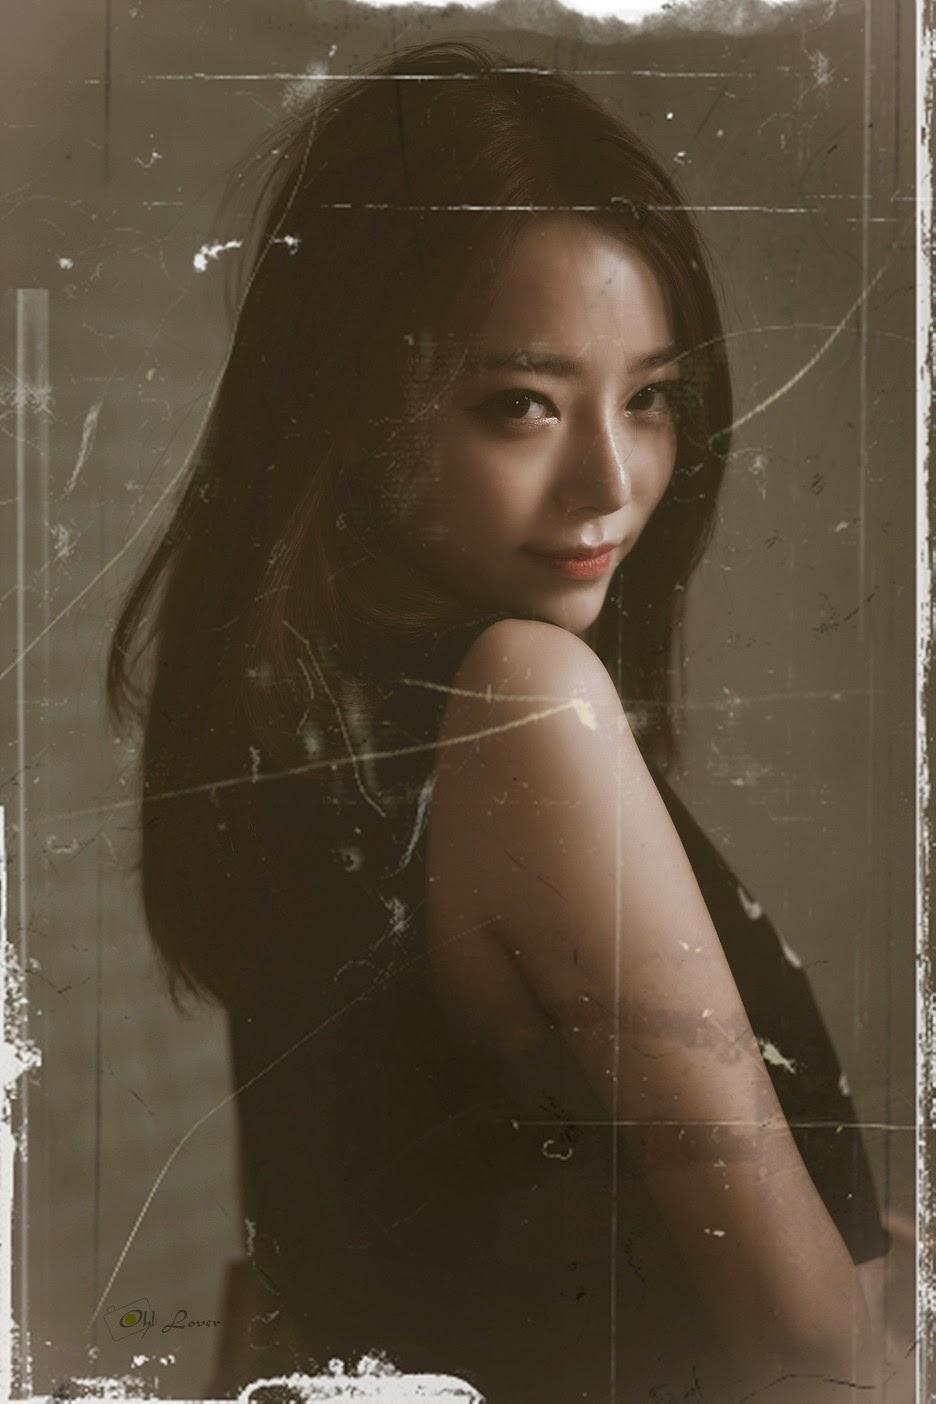 5 The wonderful Ji Yeon in 3 new sets - very cute asian girl - girlcute4u.blogspot.com